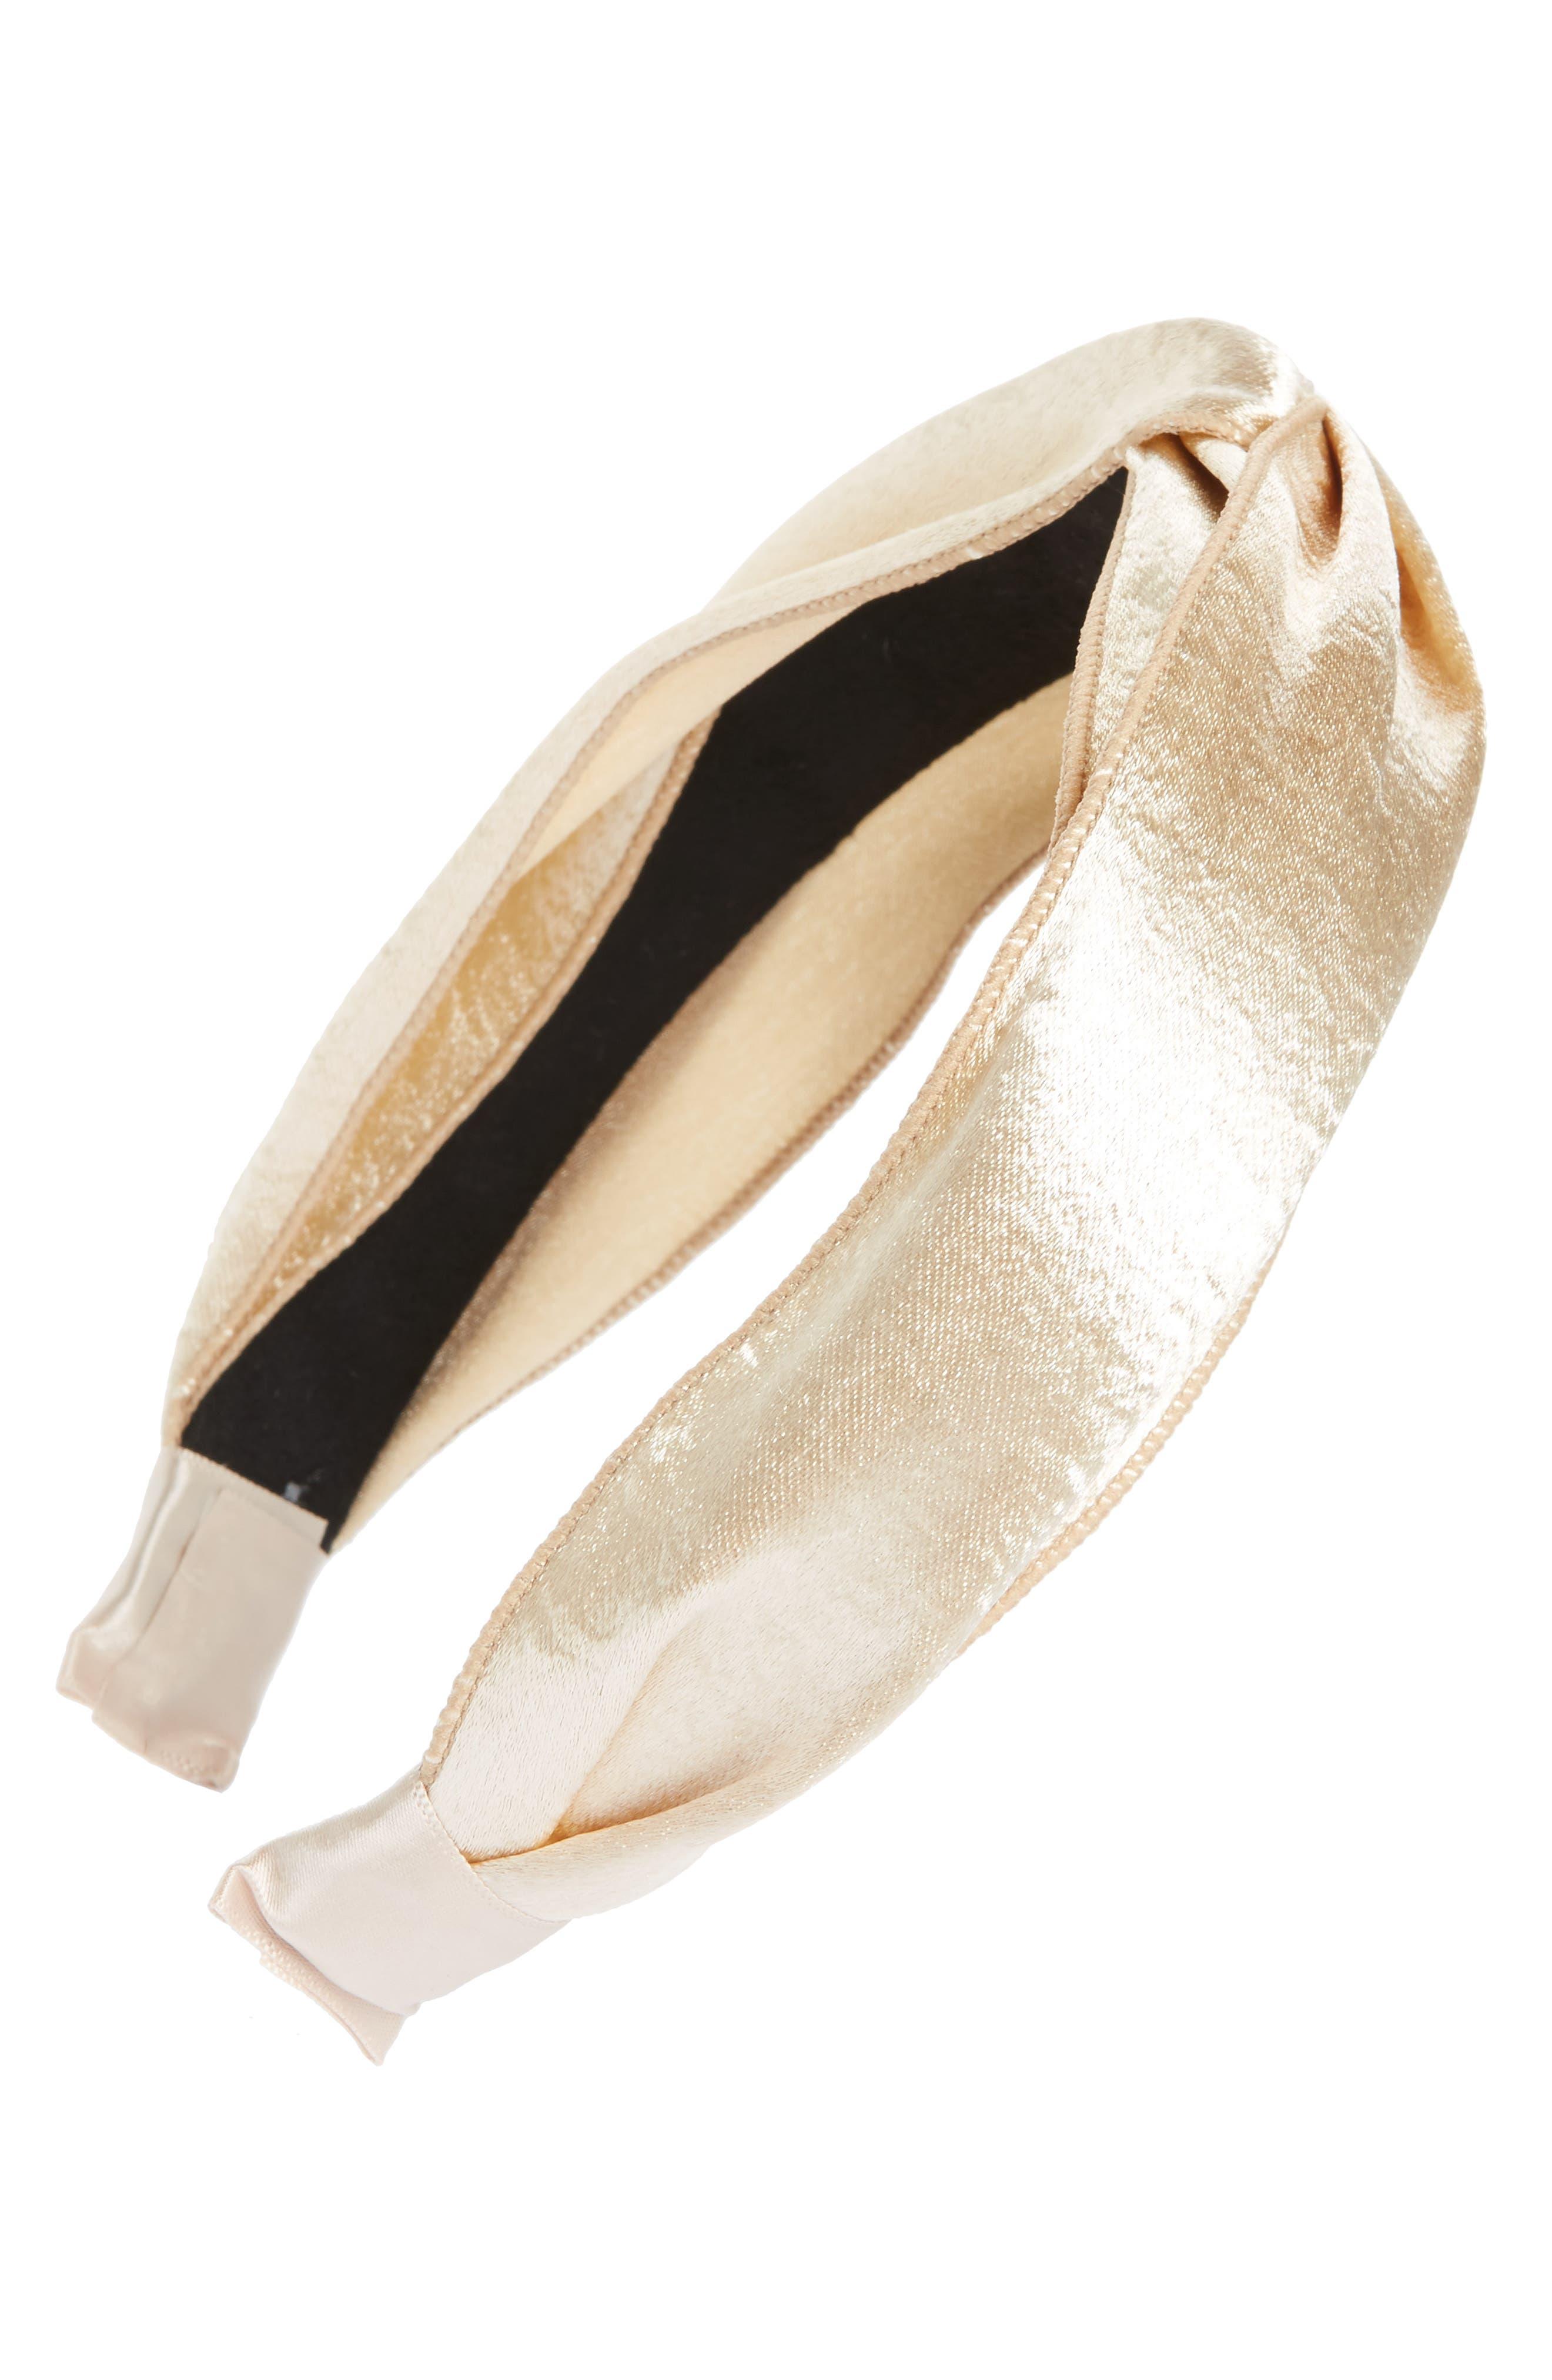 Cara Metallic Twist Knot Headband